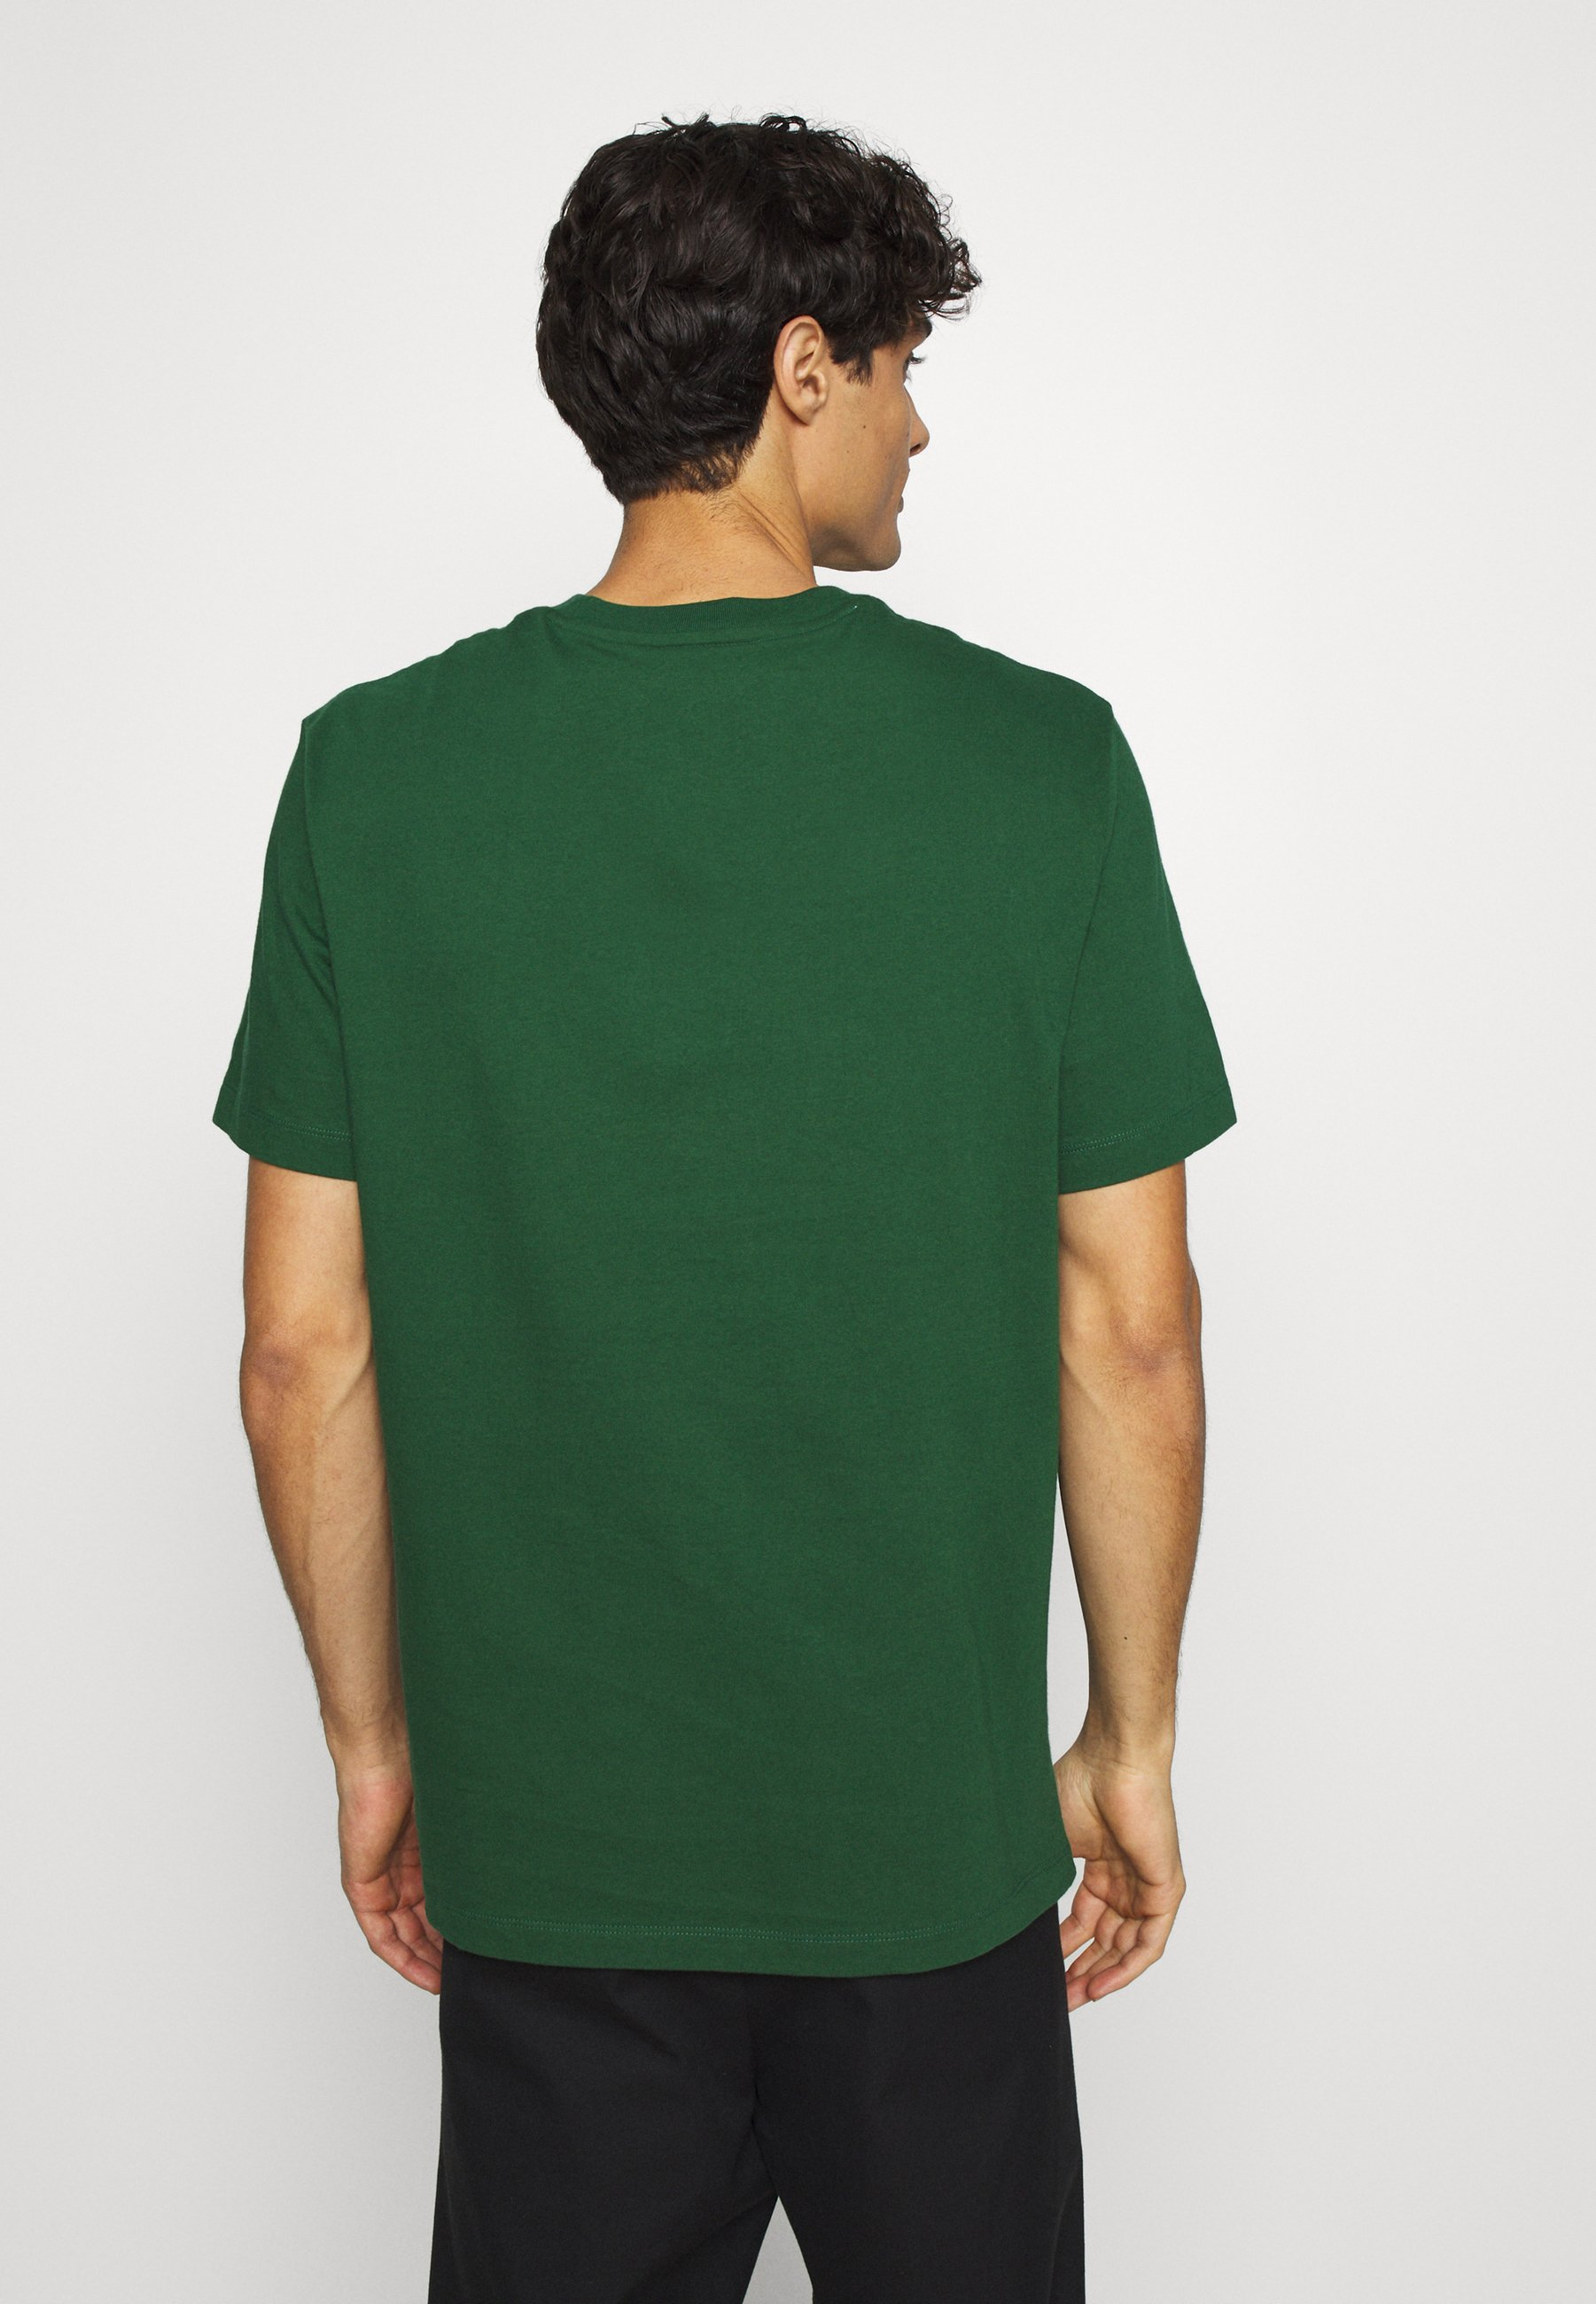 Lacoste Print T-shirt - dark green D9Jne